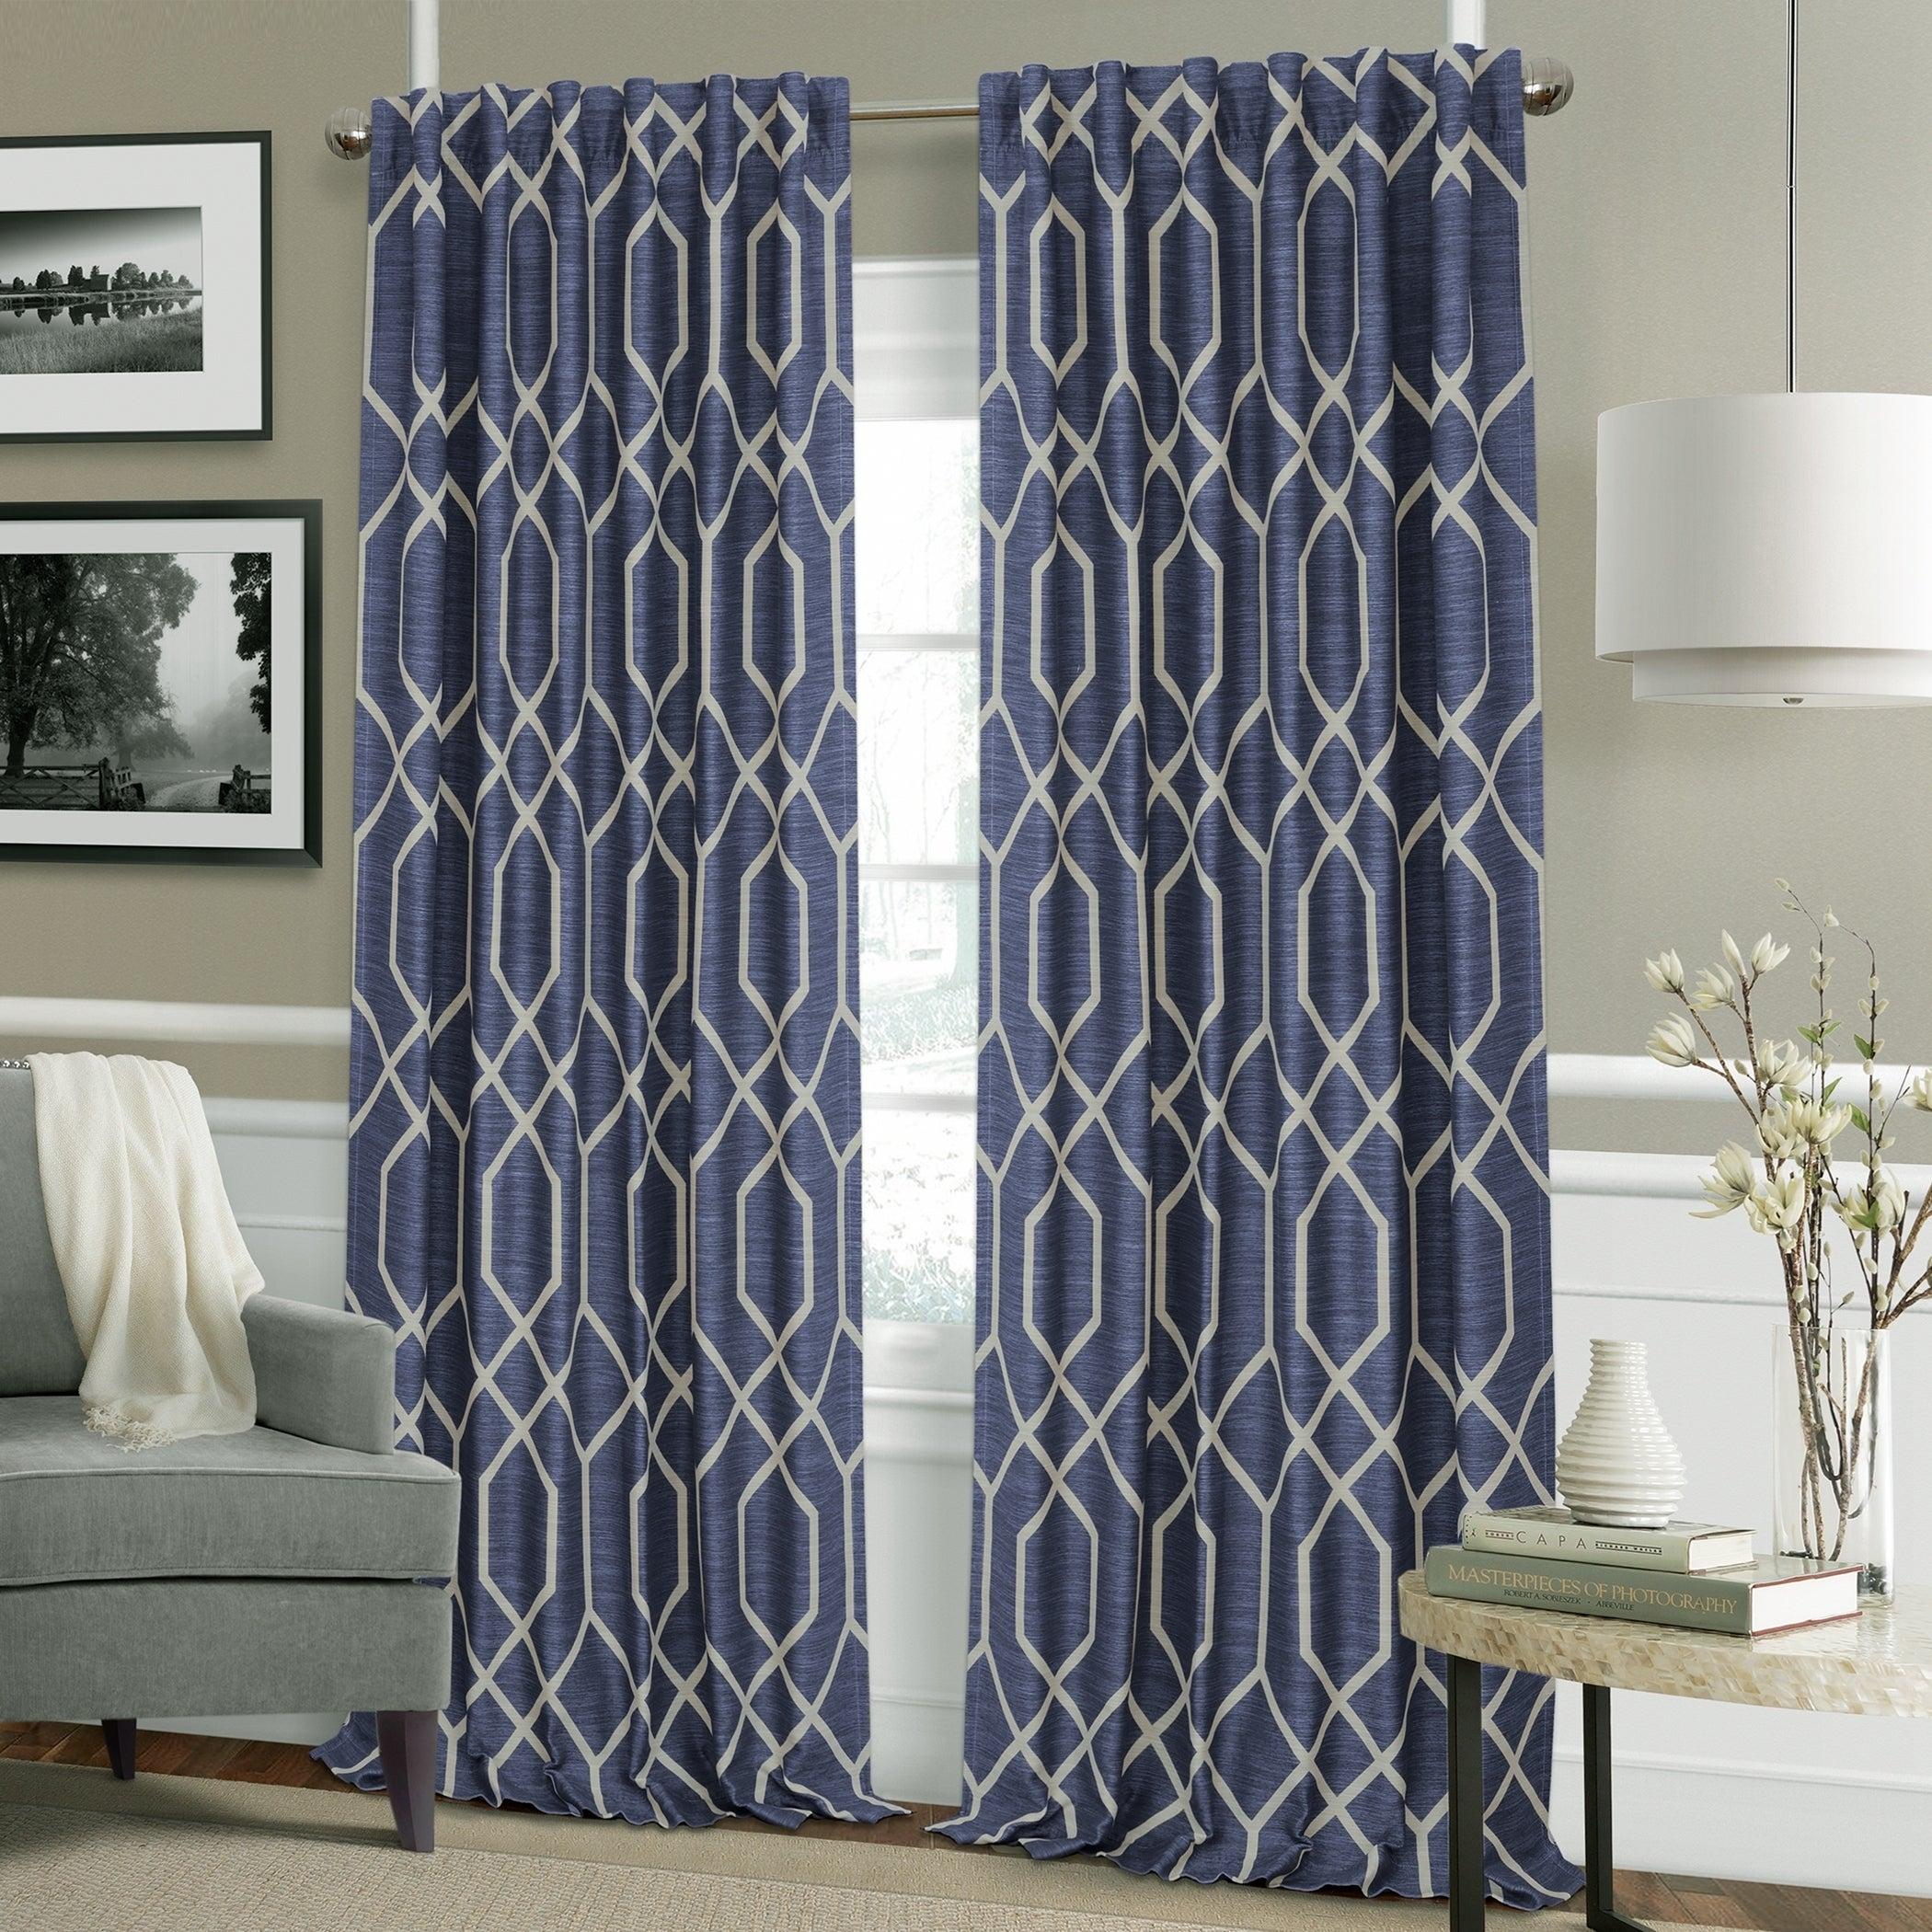 Elrene Devin Geometric Room Darkening Curtains With Kaiden Geometric Room Darkening Window Curtains (View 20 of 20)